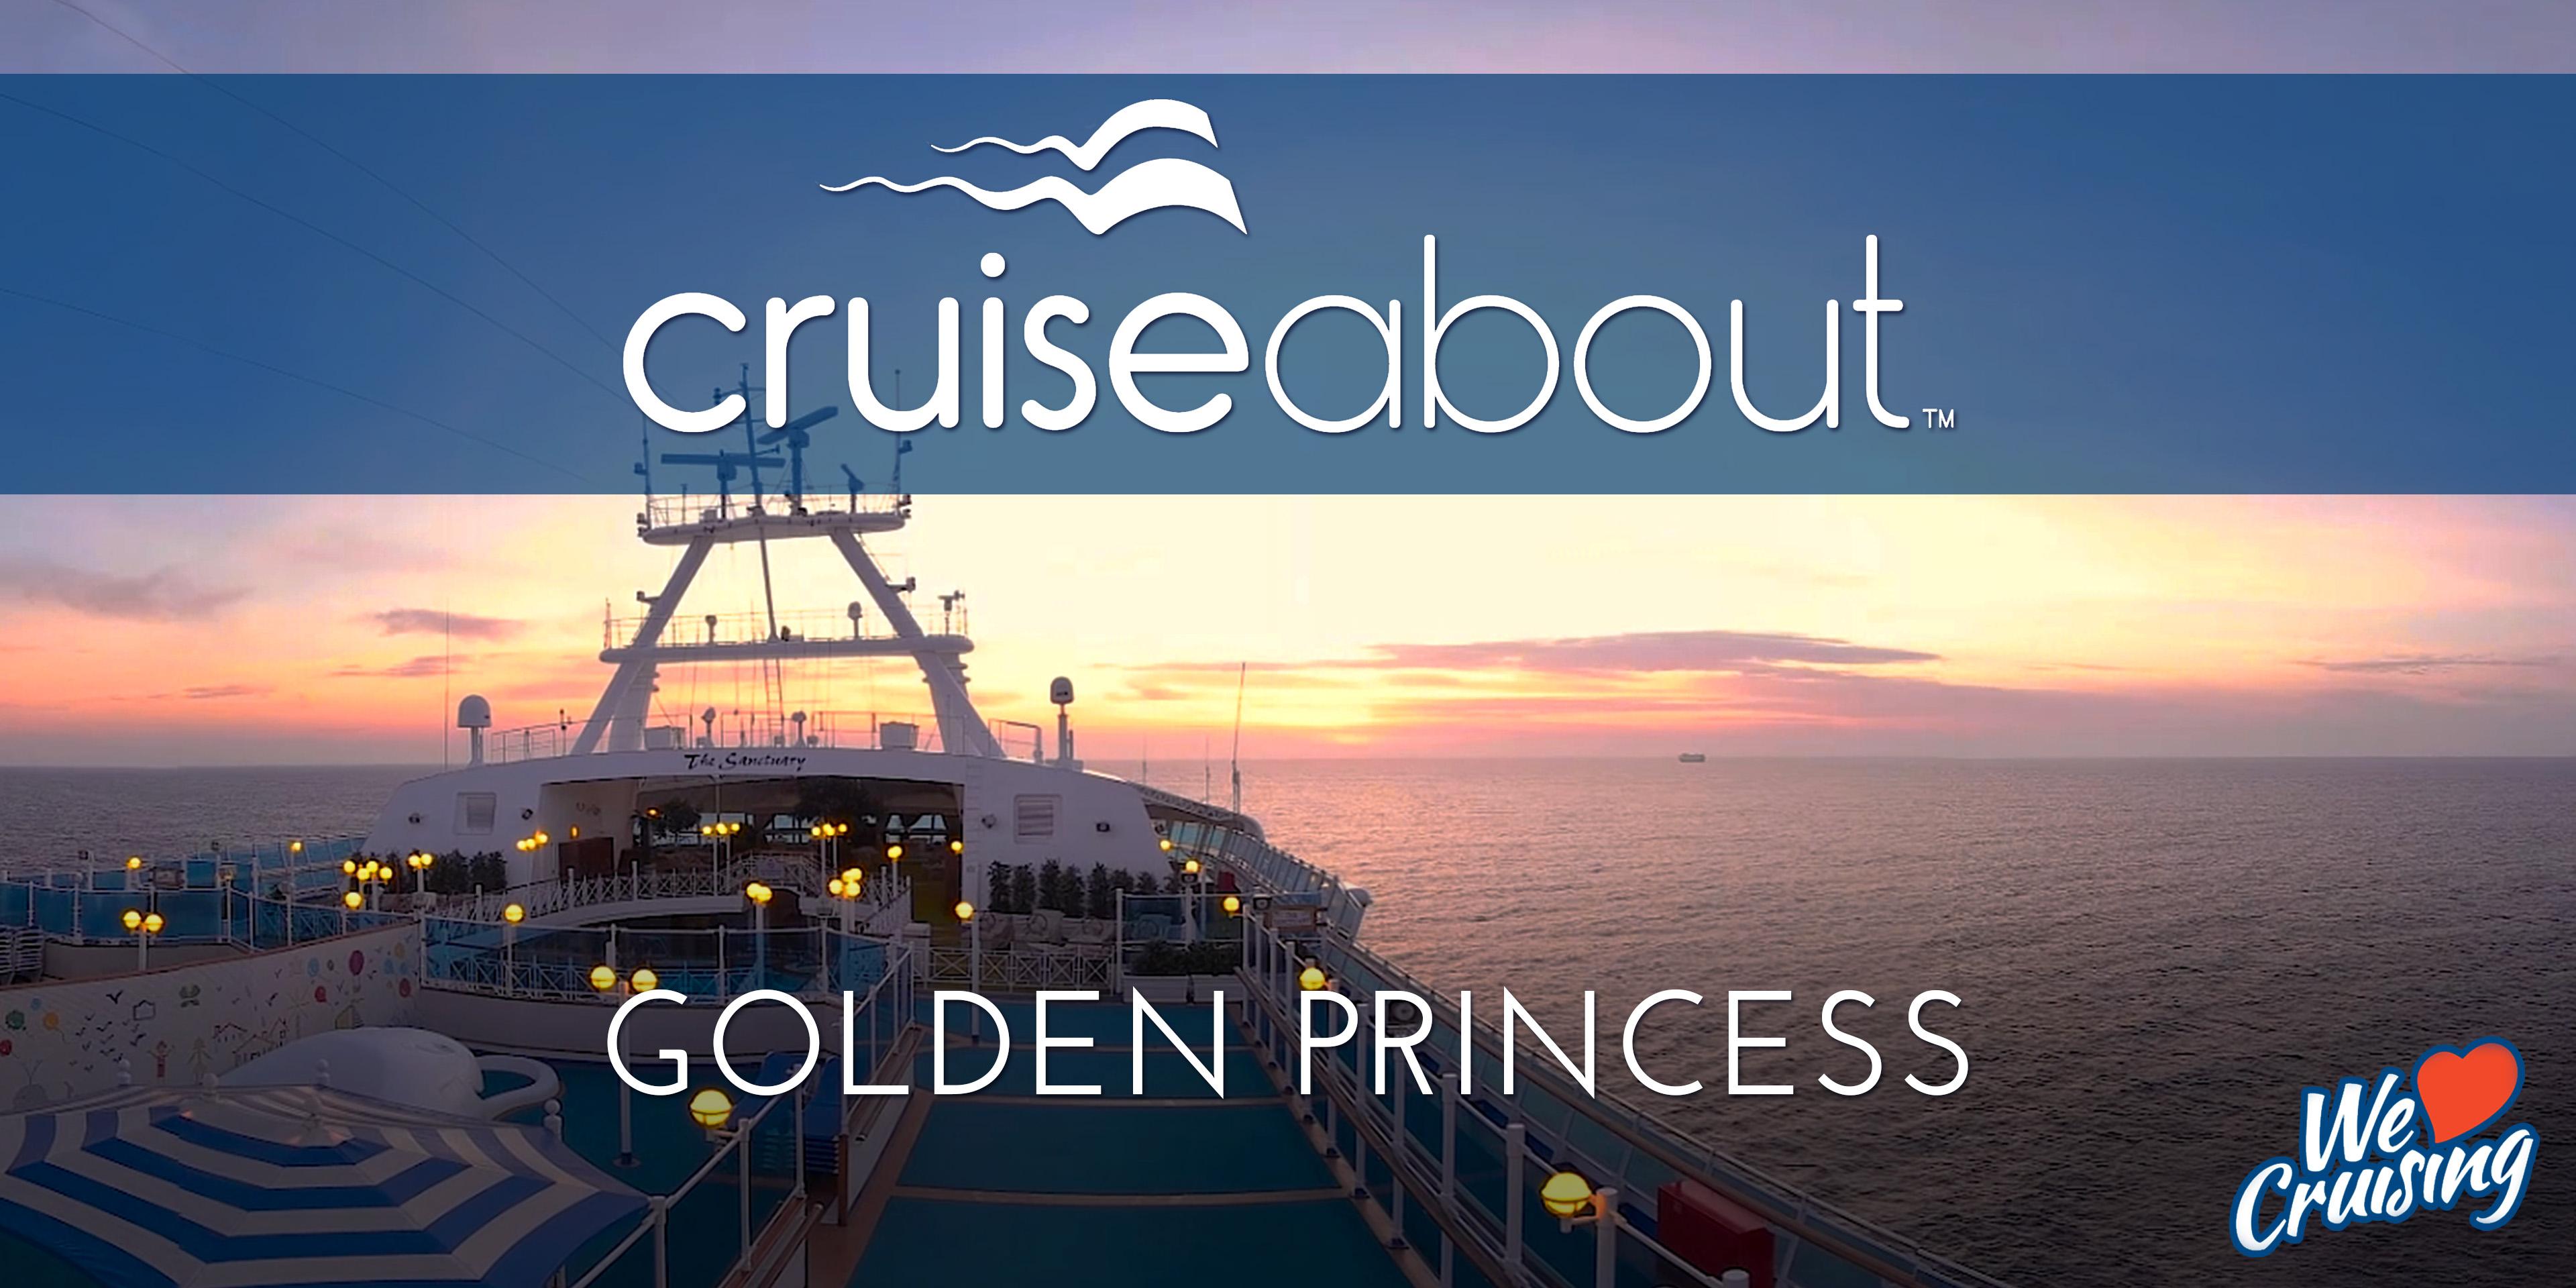 Golden Princess 360 Video Virtual Tour Blog By Panedia